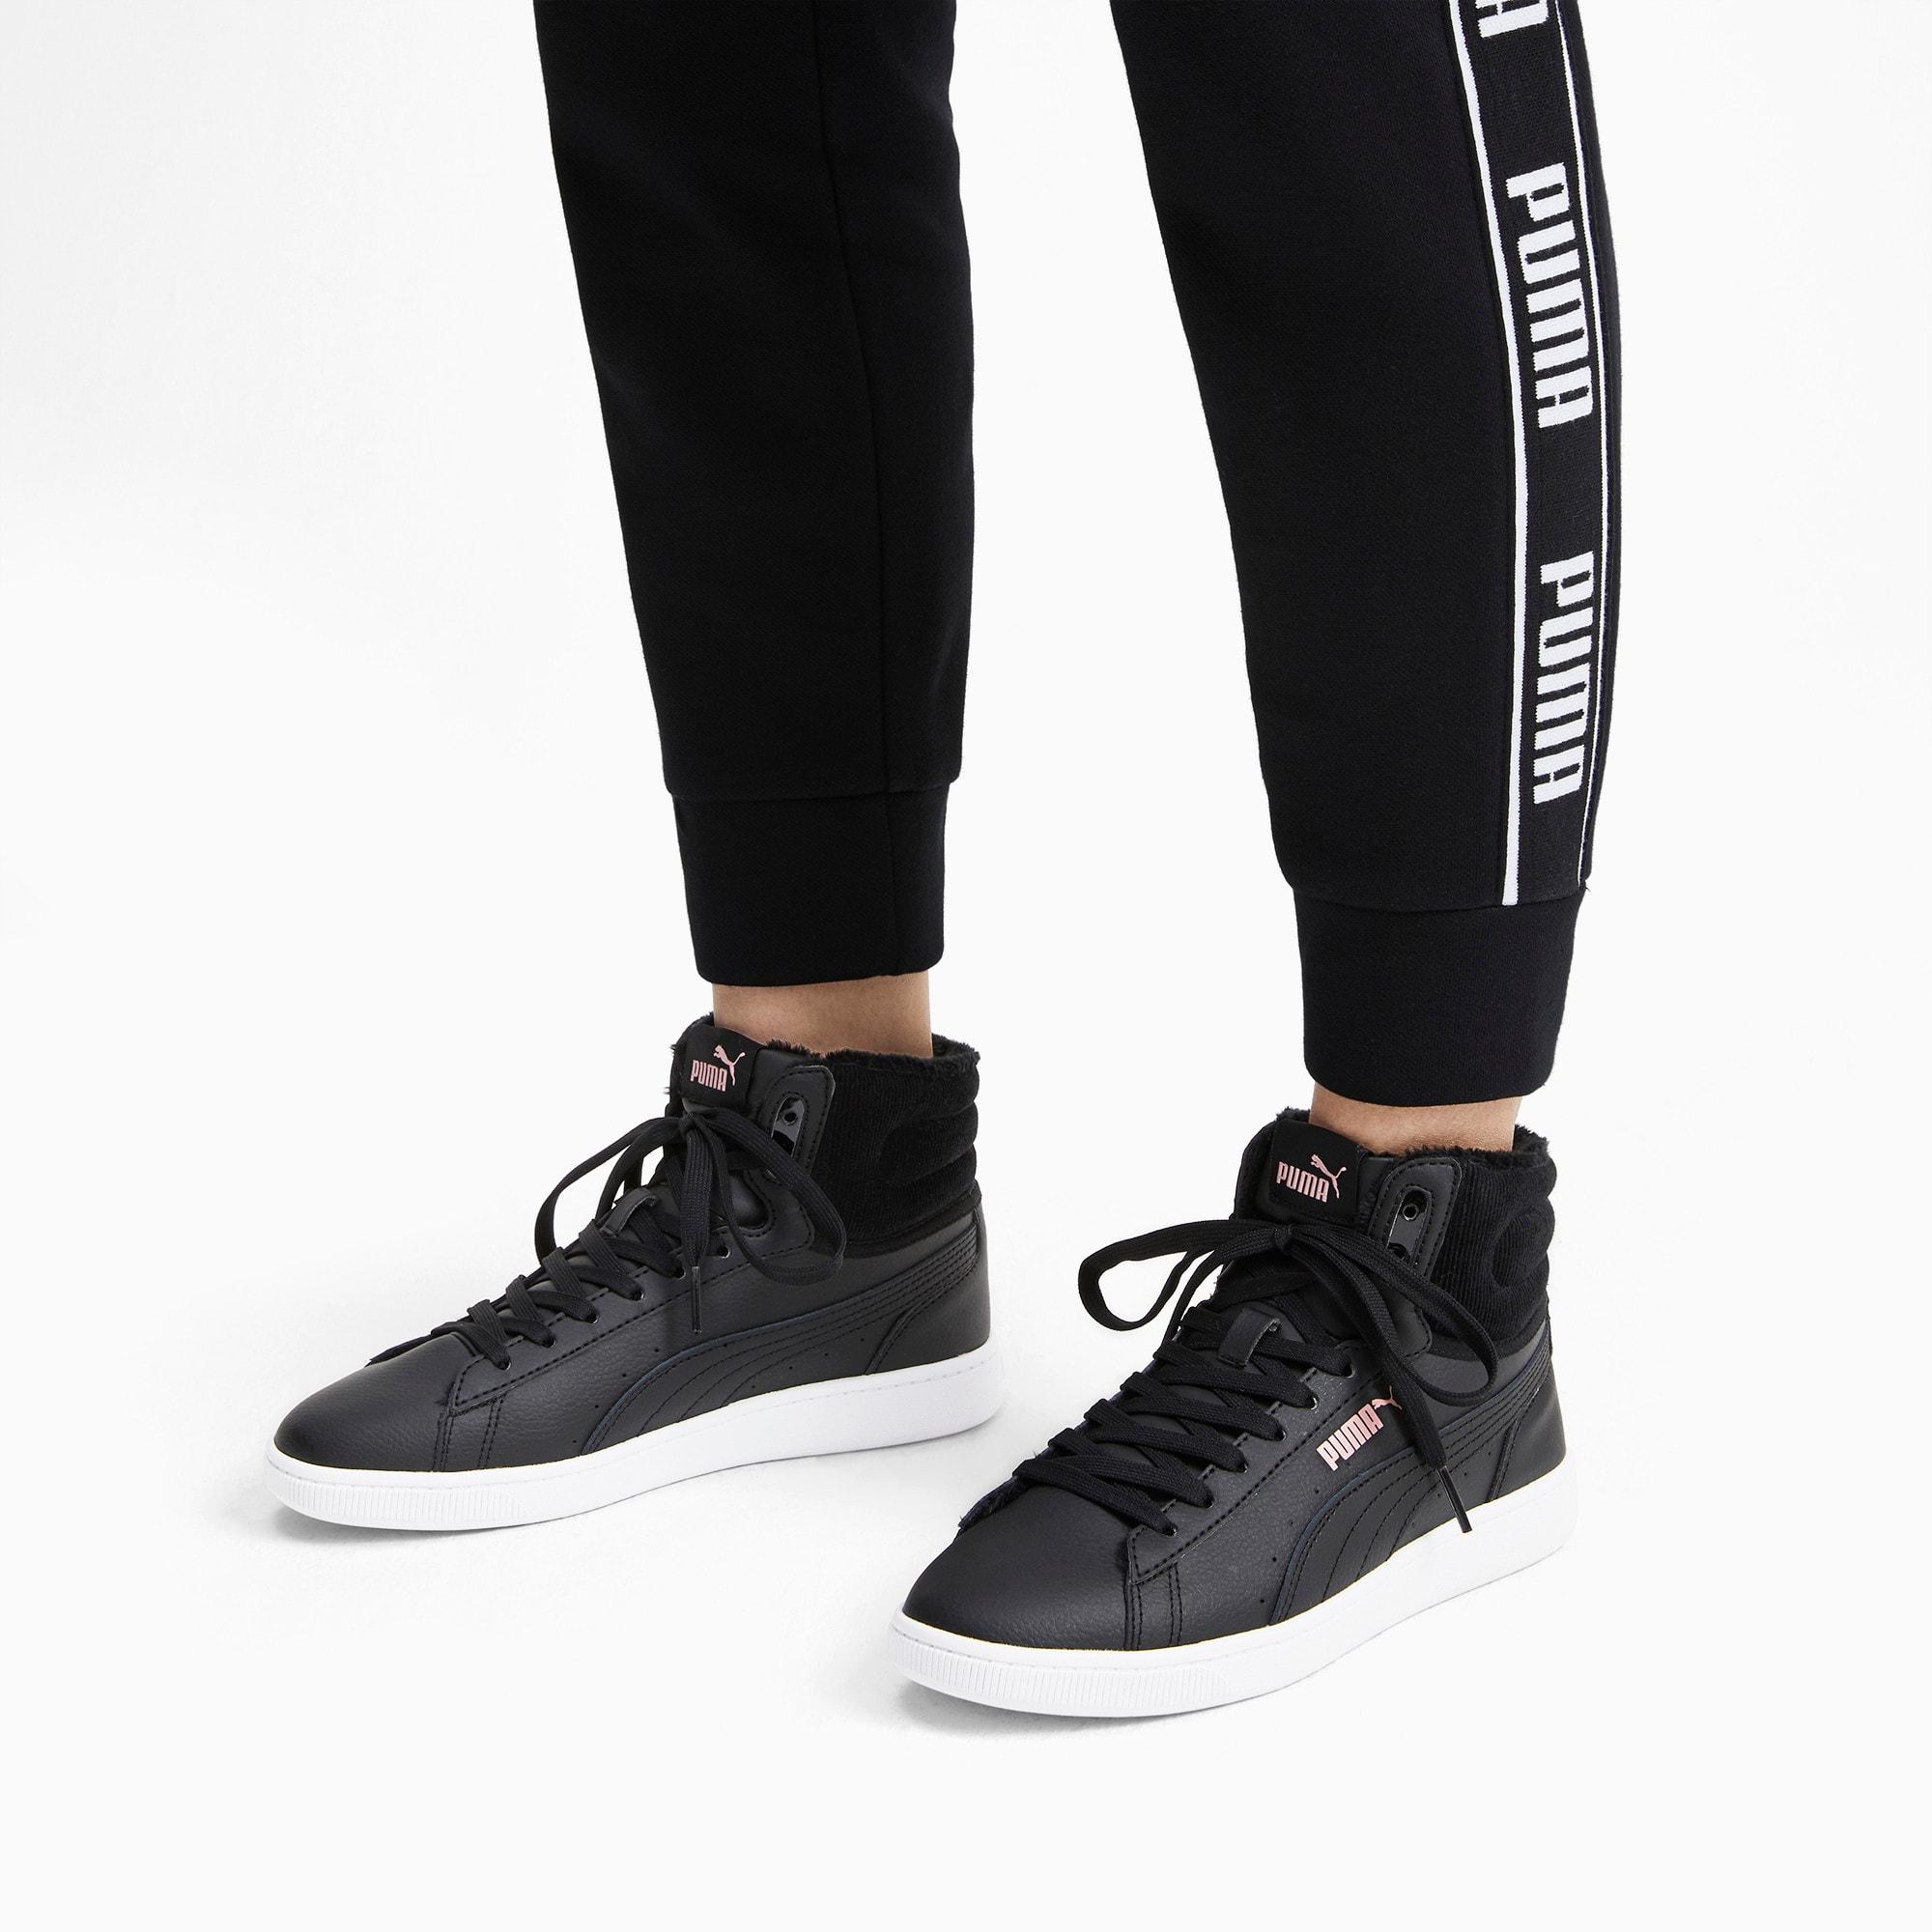 Thumbnail 2 of Vikky v2 mittelhoher Damen Winter Sneaker, Puma Black-Bridal Rose-White, medium